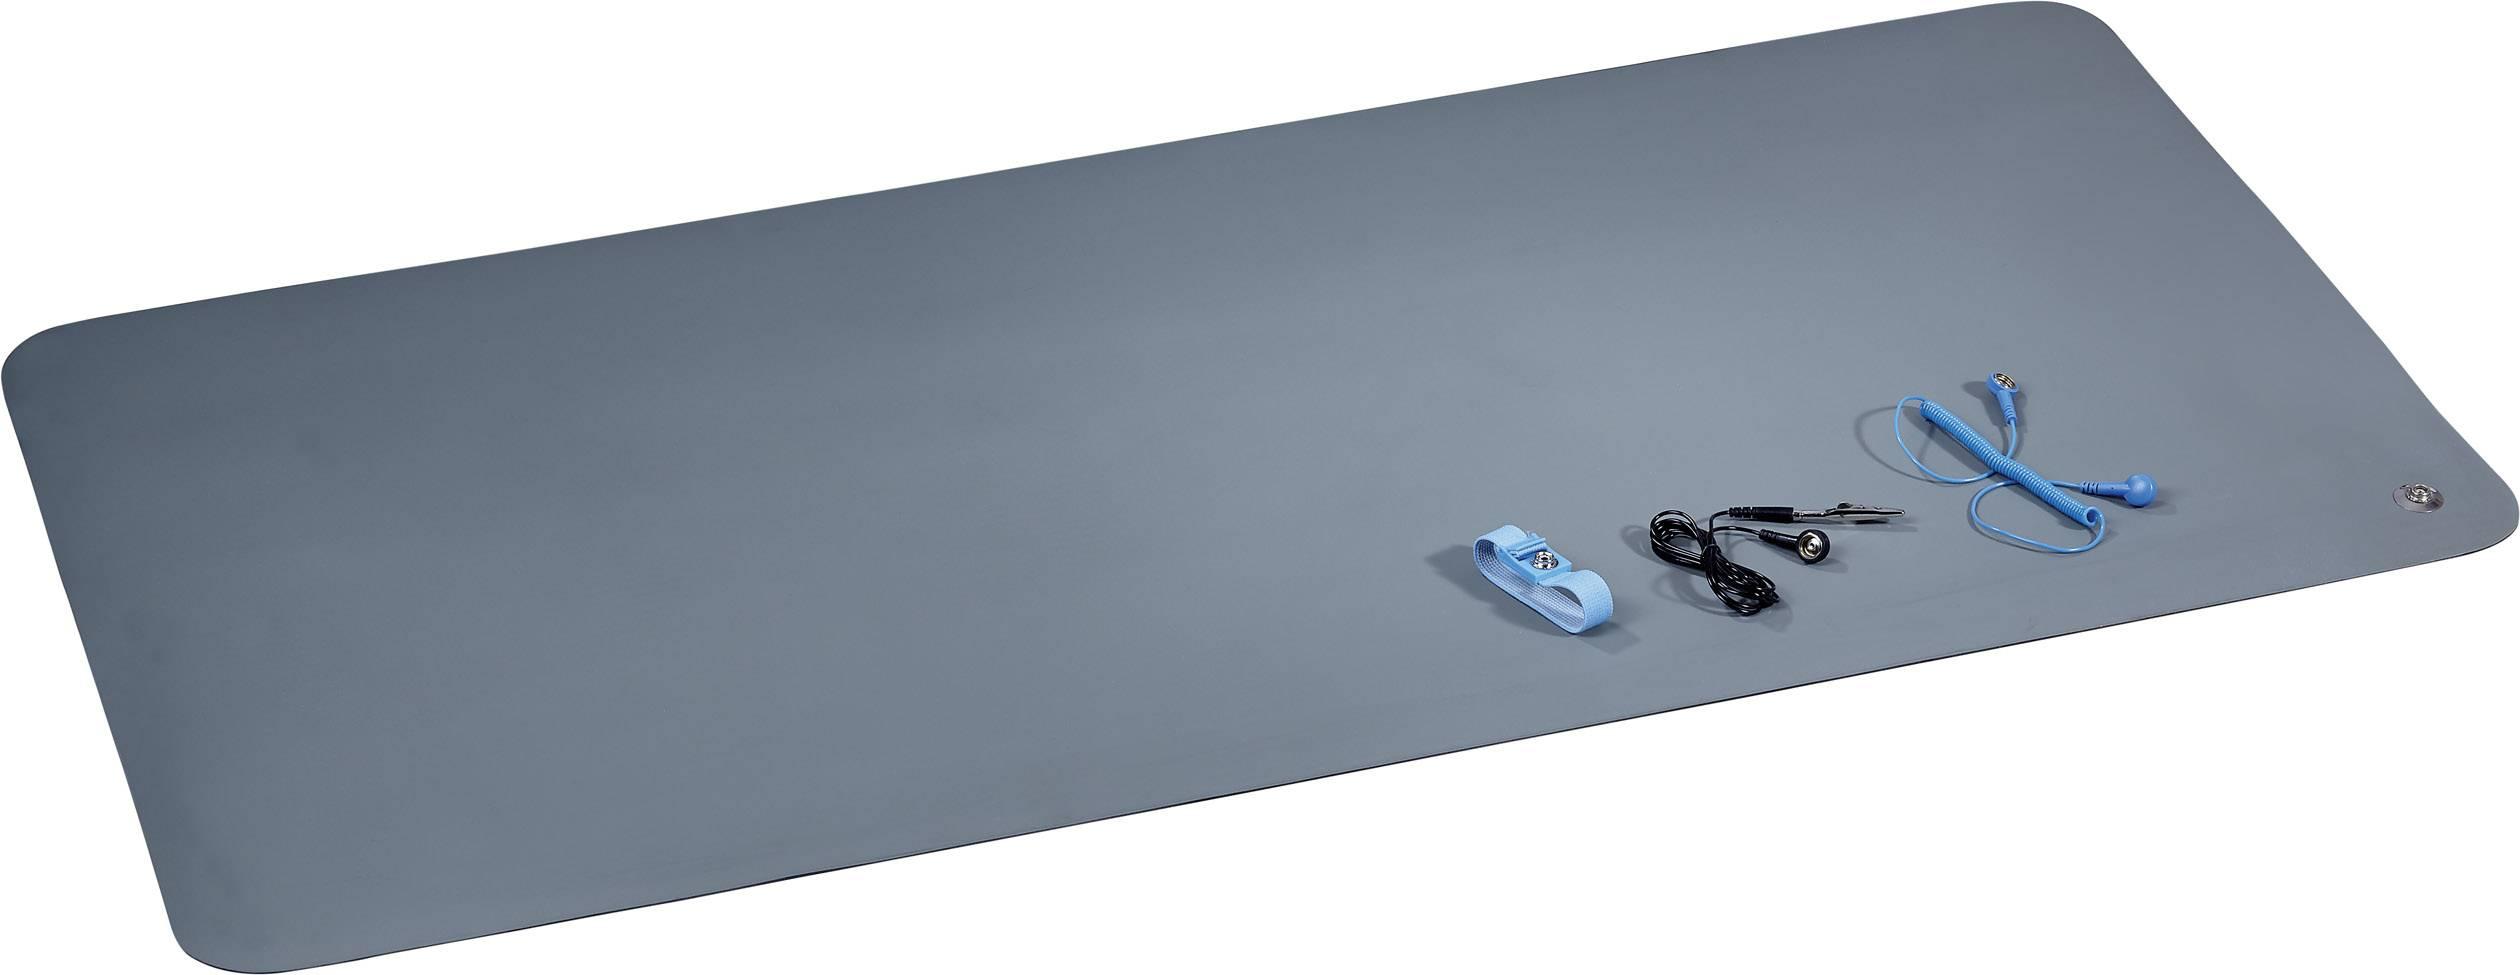 Sada ESD podložky na stůl TRU COMPONENTS 1570452, (d x š) 119 cm x 59 cm, šedozelená, černá